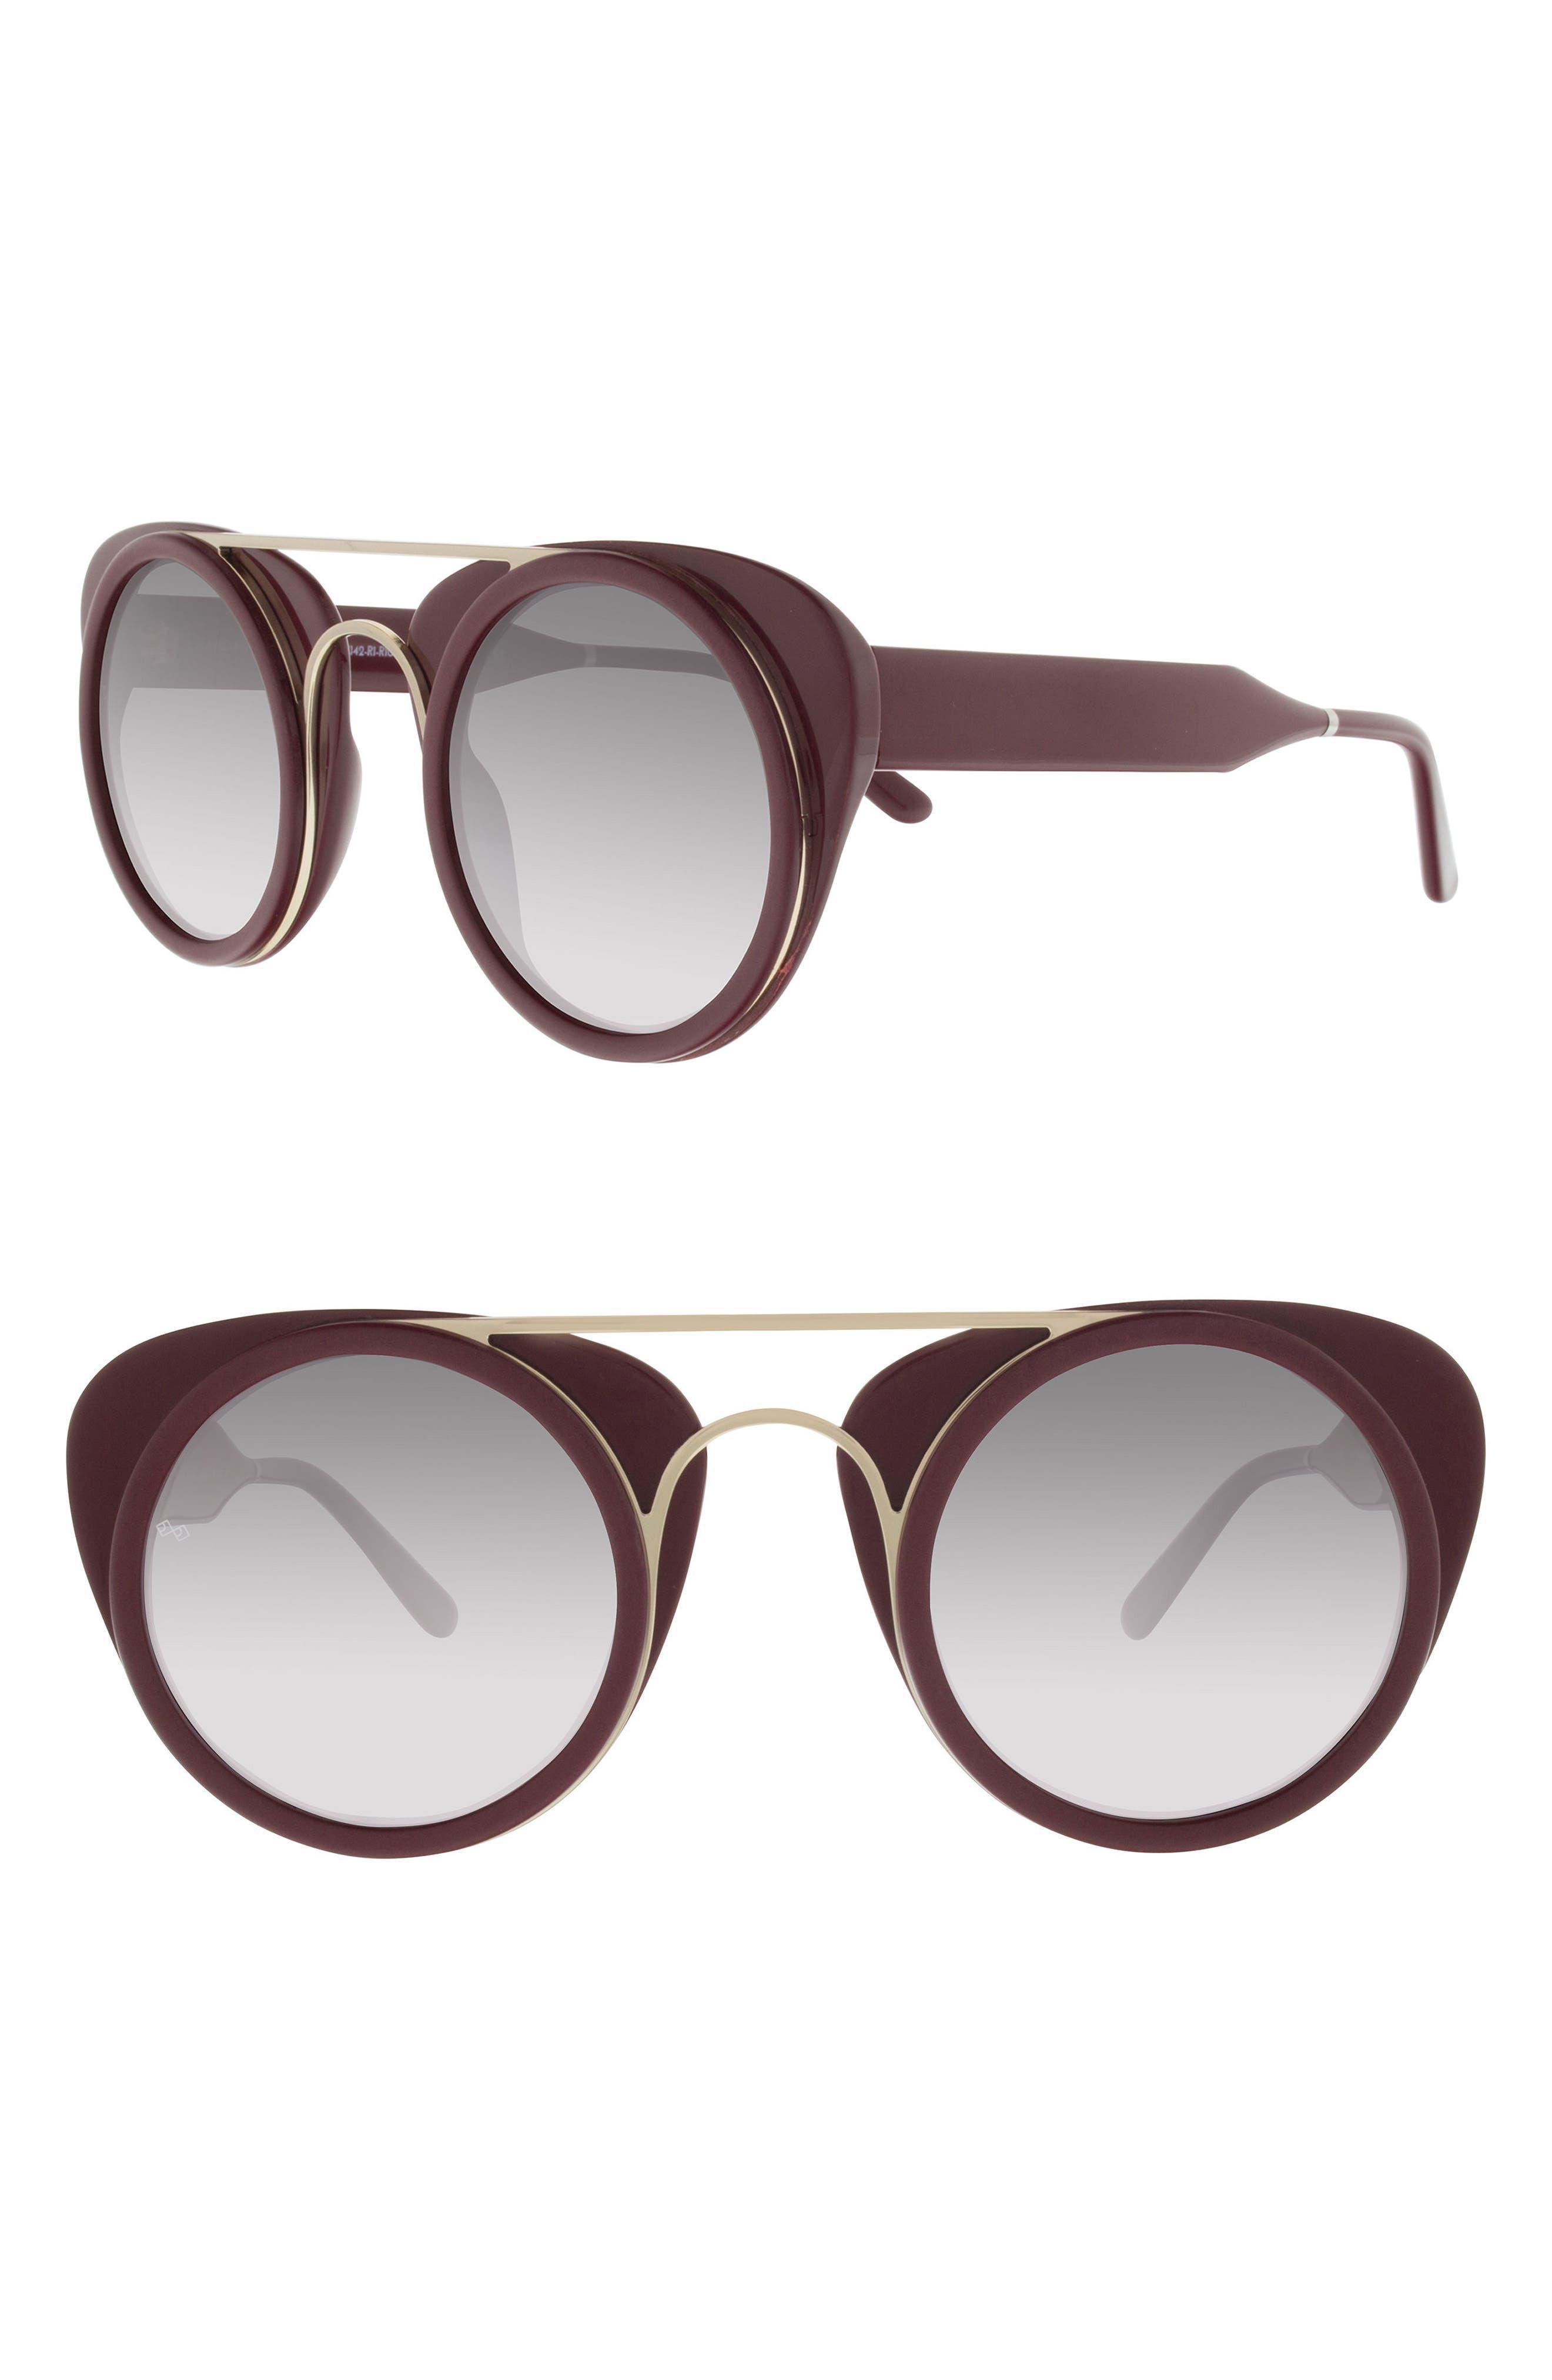 Soda Pop 3 47mm Round Sunglasses,                             Main thumbnail 1, color,                             BURGUNDY/ BURGUNDY/ GOLD